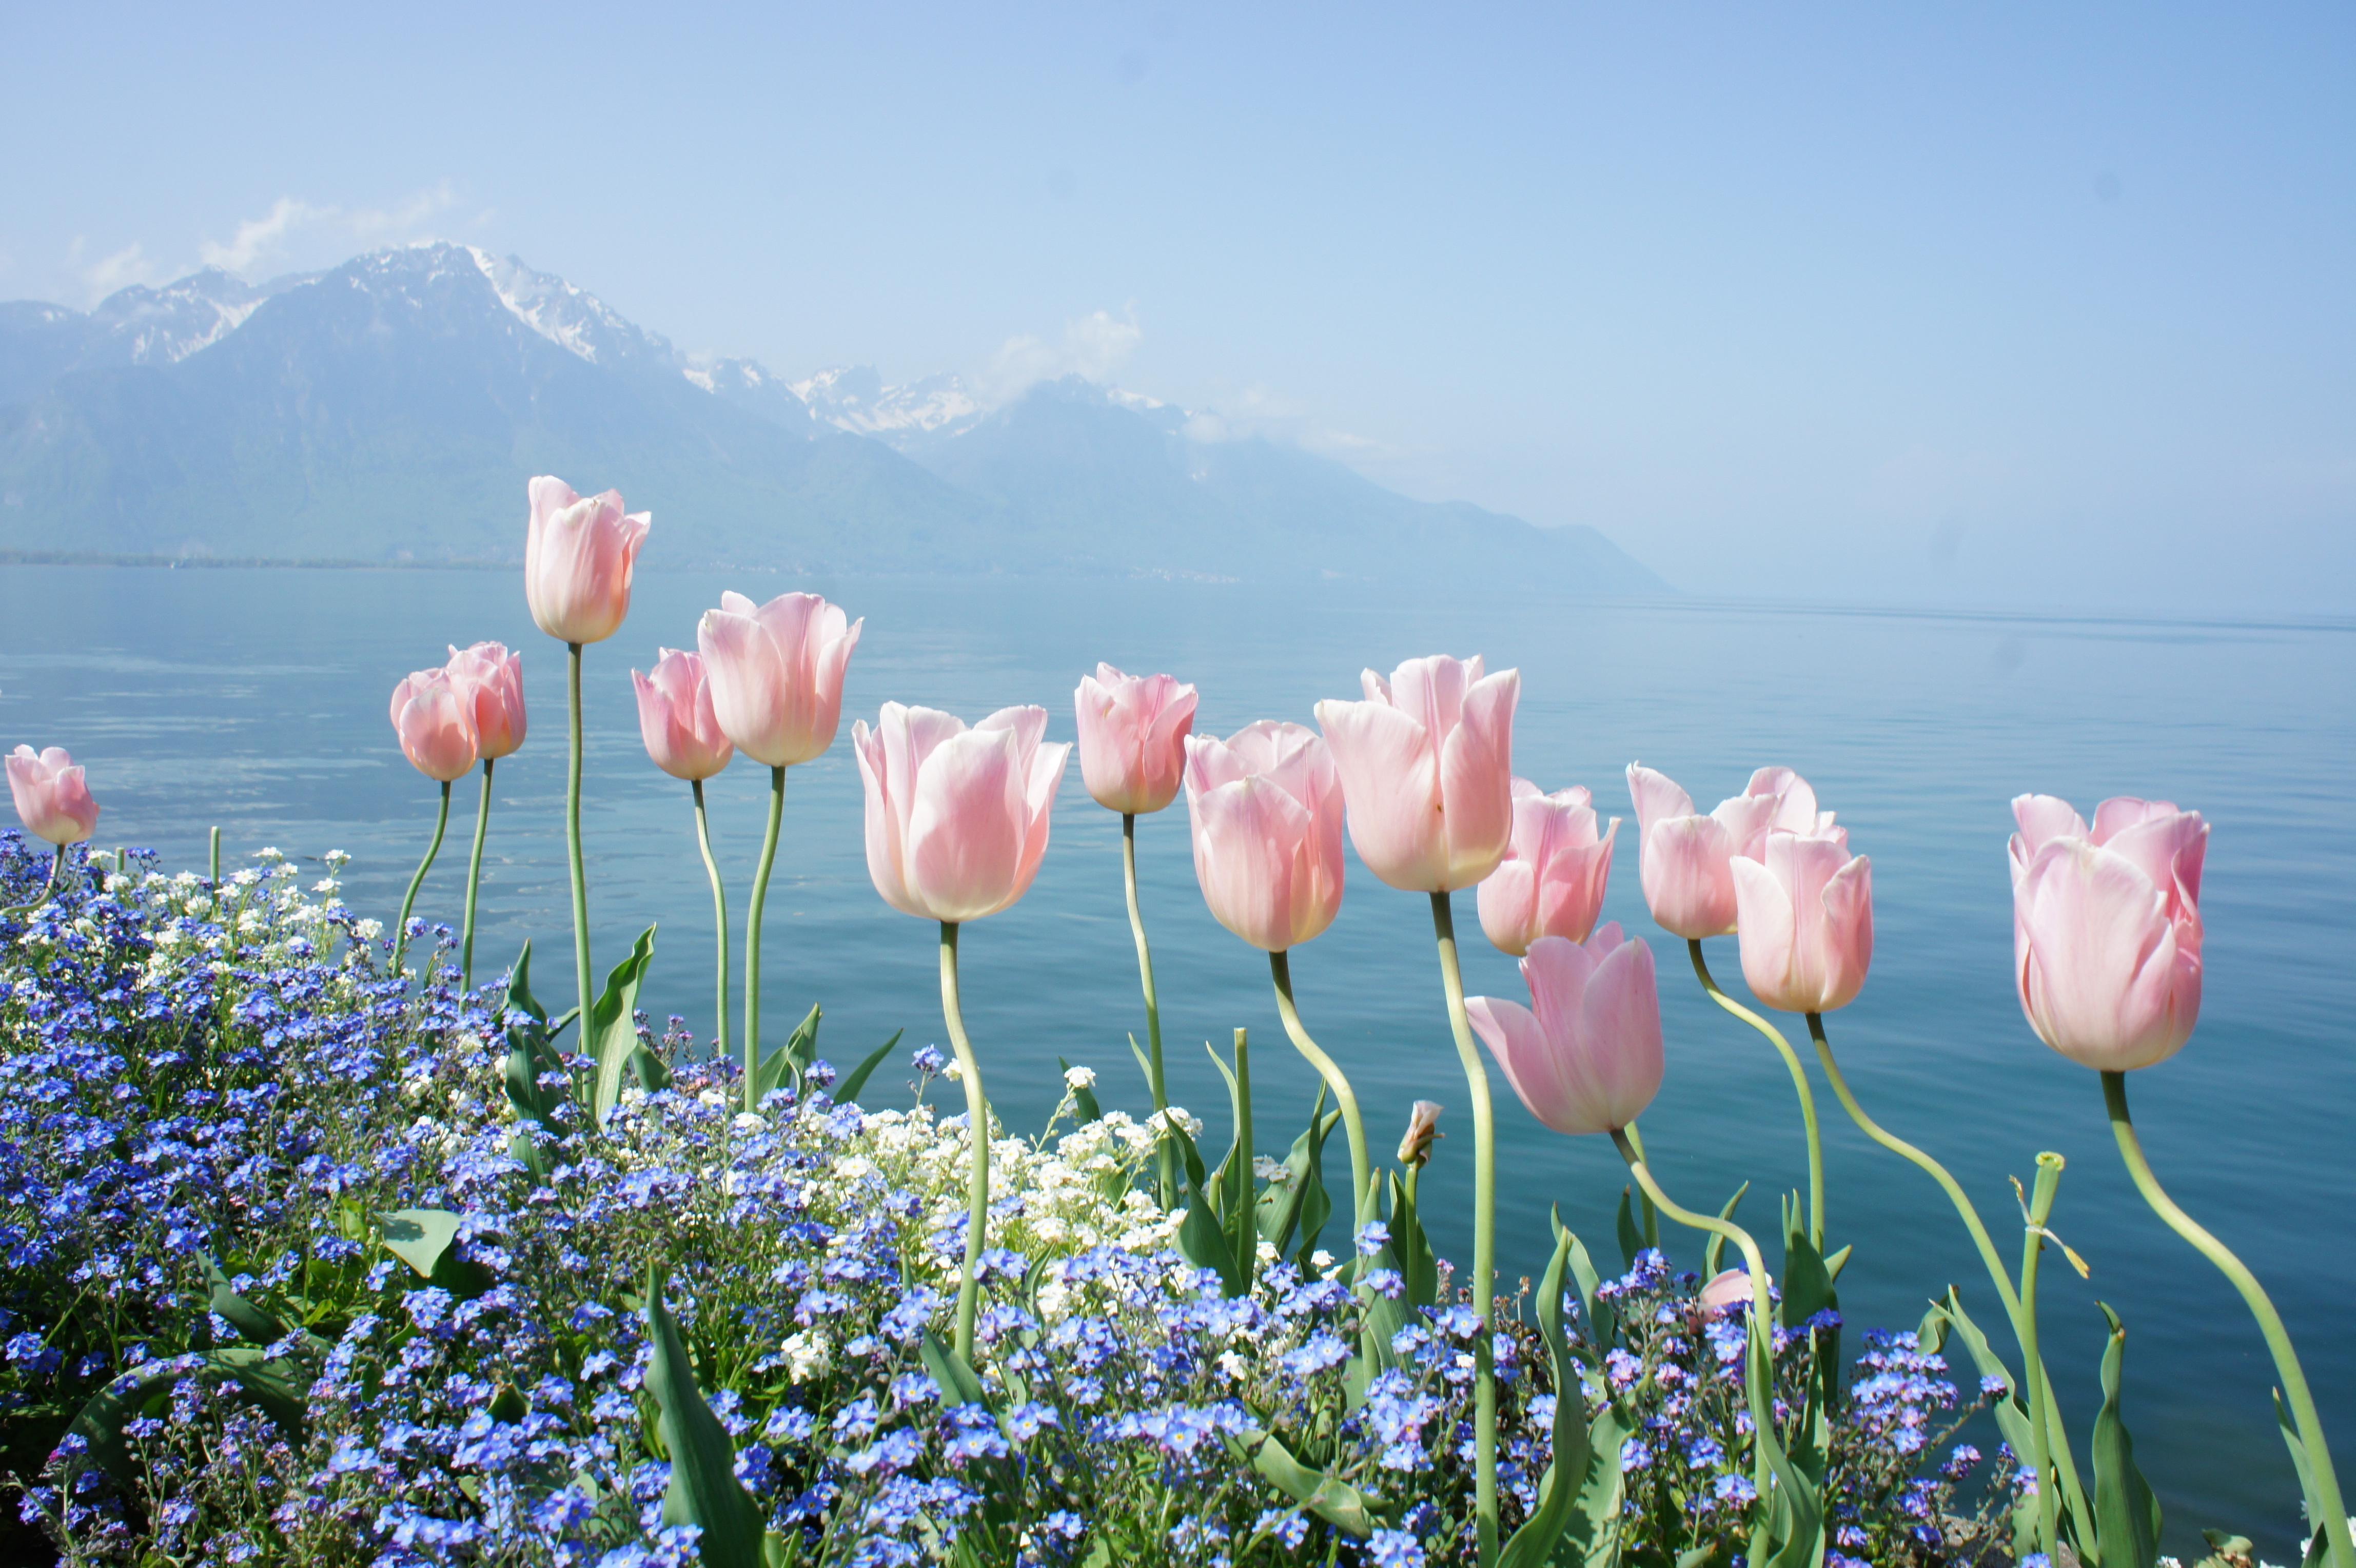 Sky Lake Flowers Spring Tulips Wallpaper 105198 4592x3056px